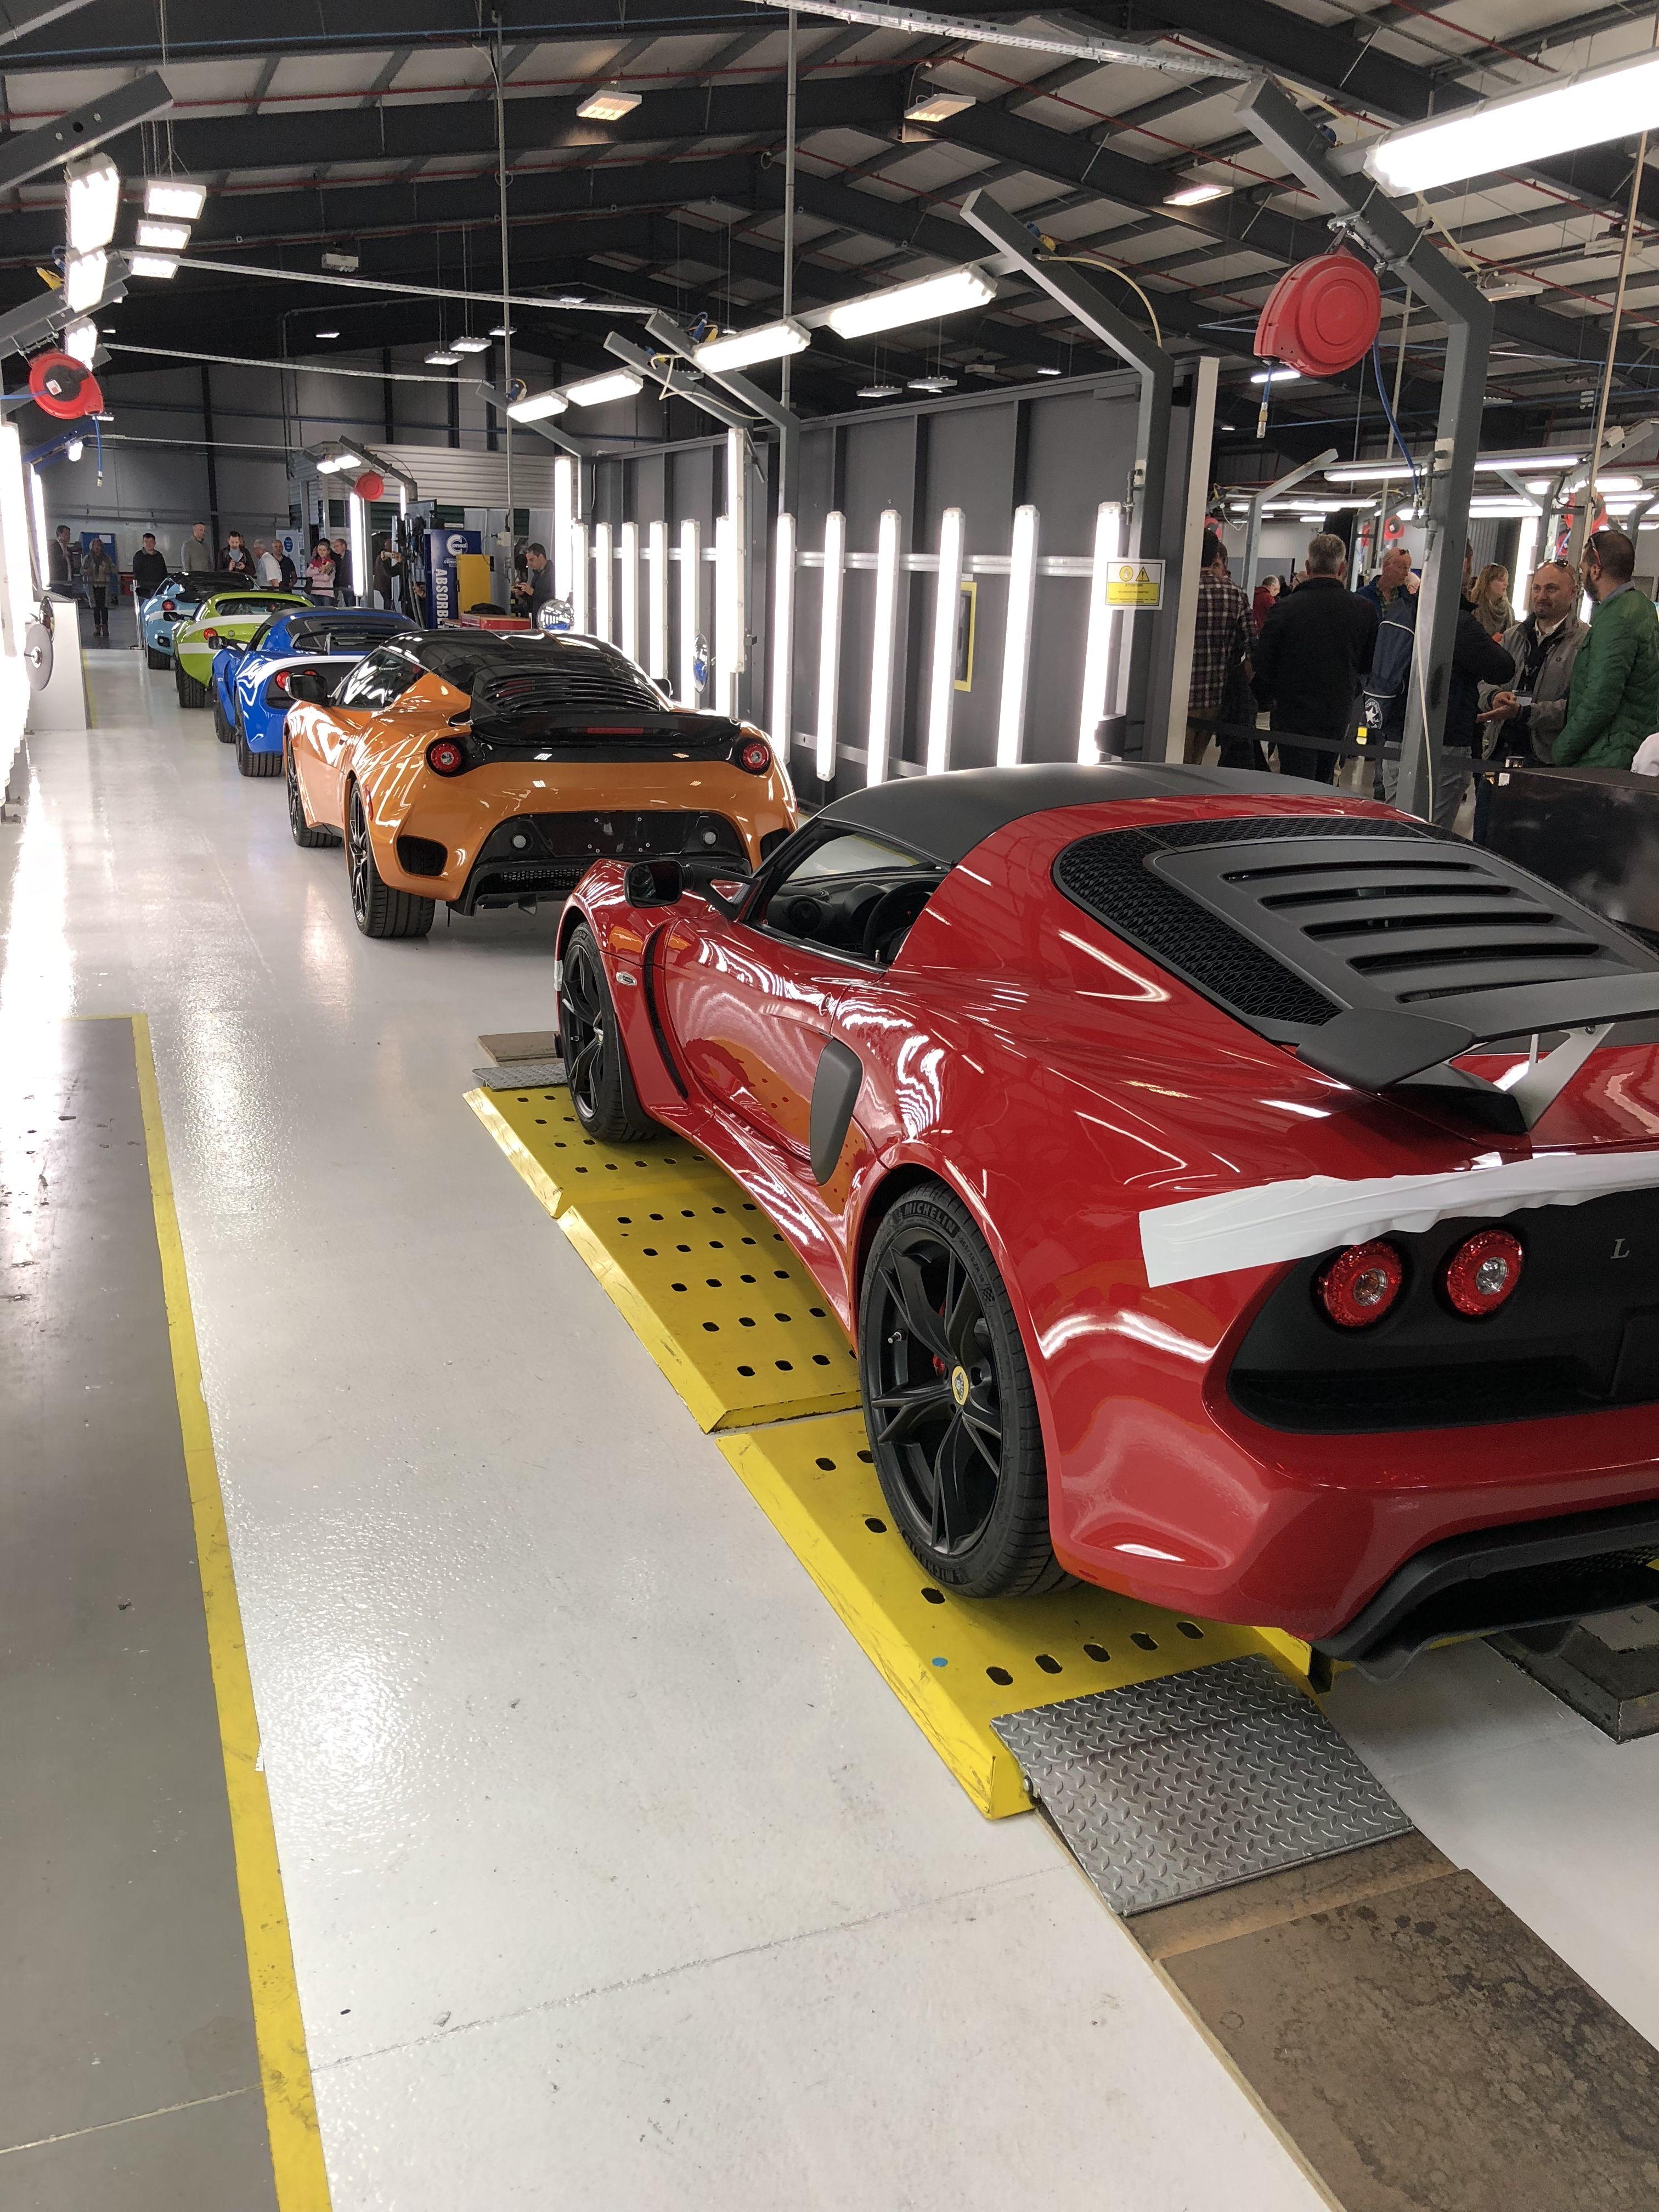 Lotus Factory Line At Hethel Armored Vehicles Lotus Car Cool Cars